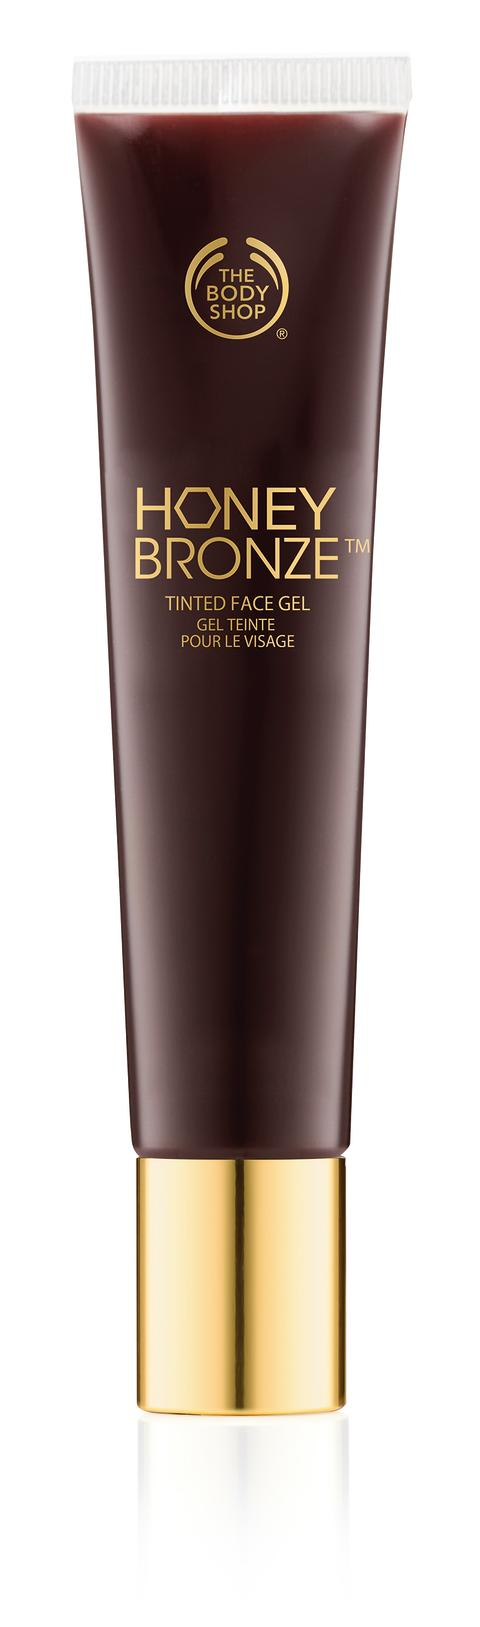 Honey Bronze™ Face Gel